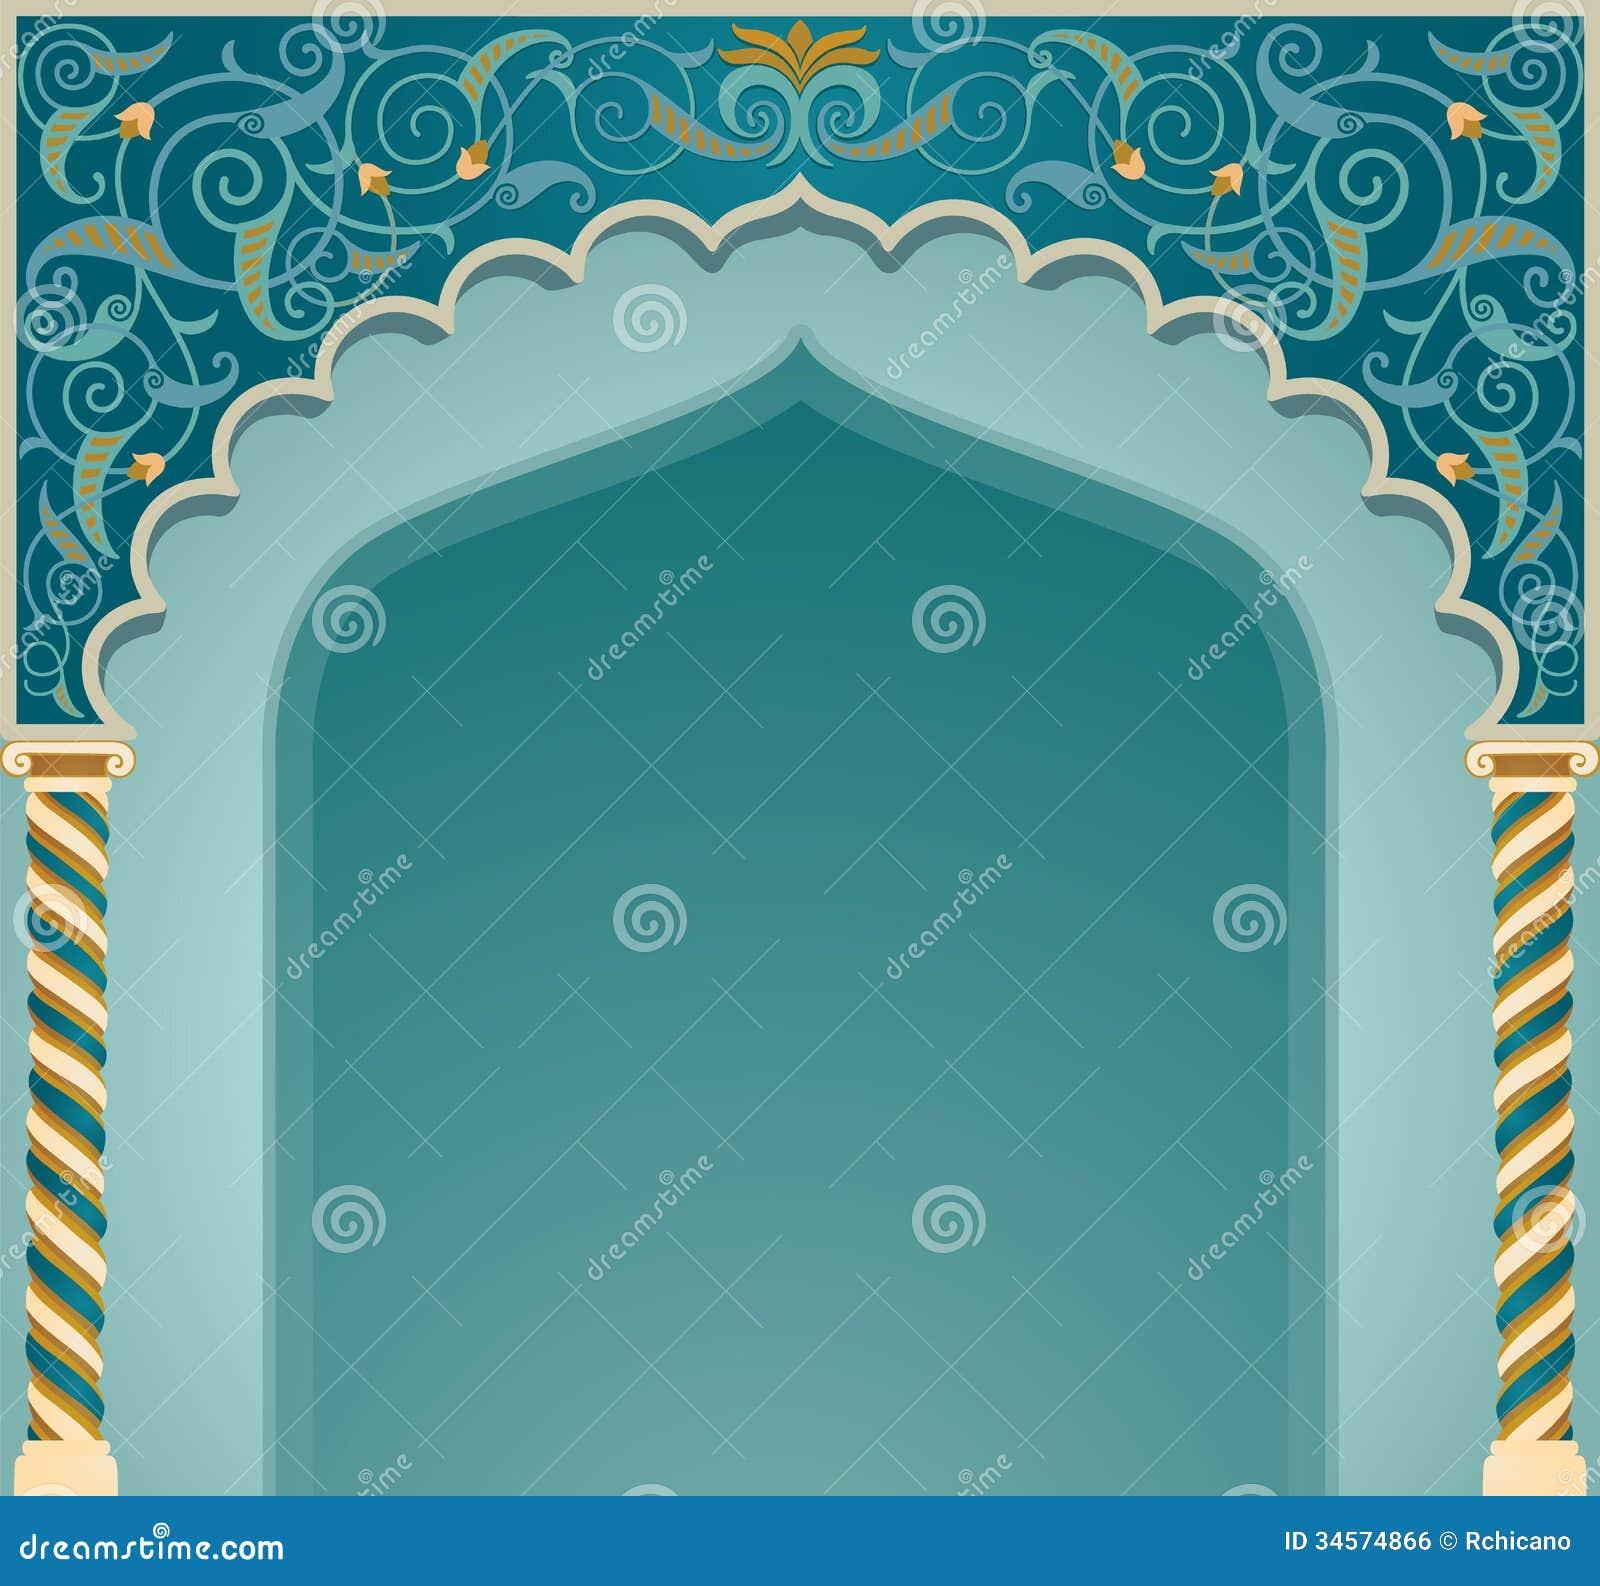 islamic arch design vector illustration high detailed eps format 34574866